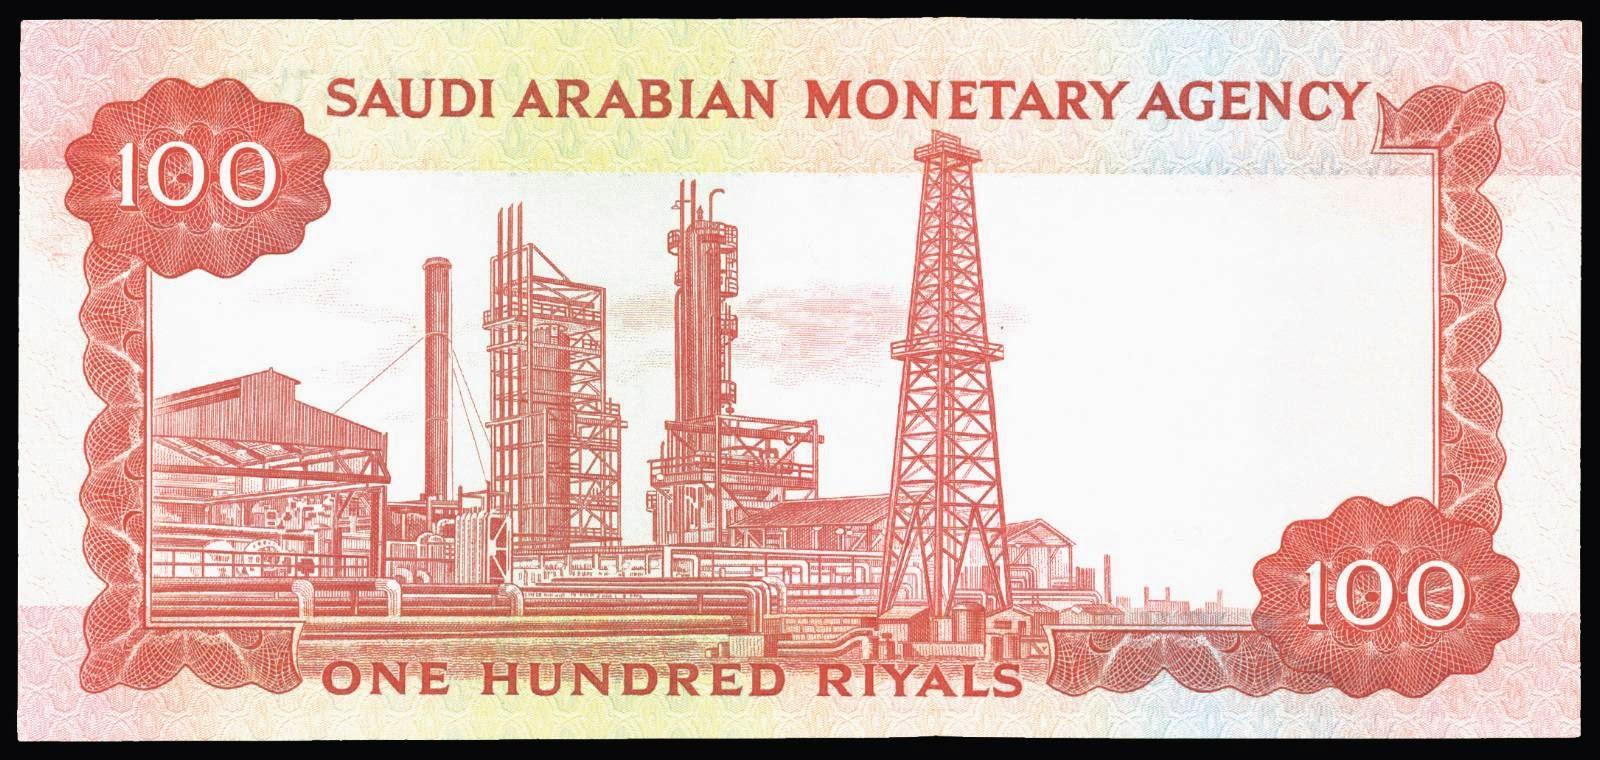 Saudi Arabia money currency 100 Saudi Riyals banknote 1968 Aramco Refinery